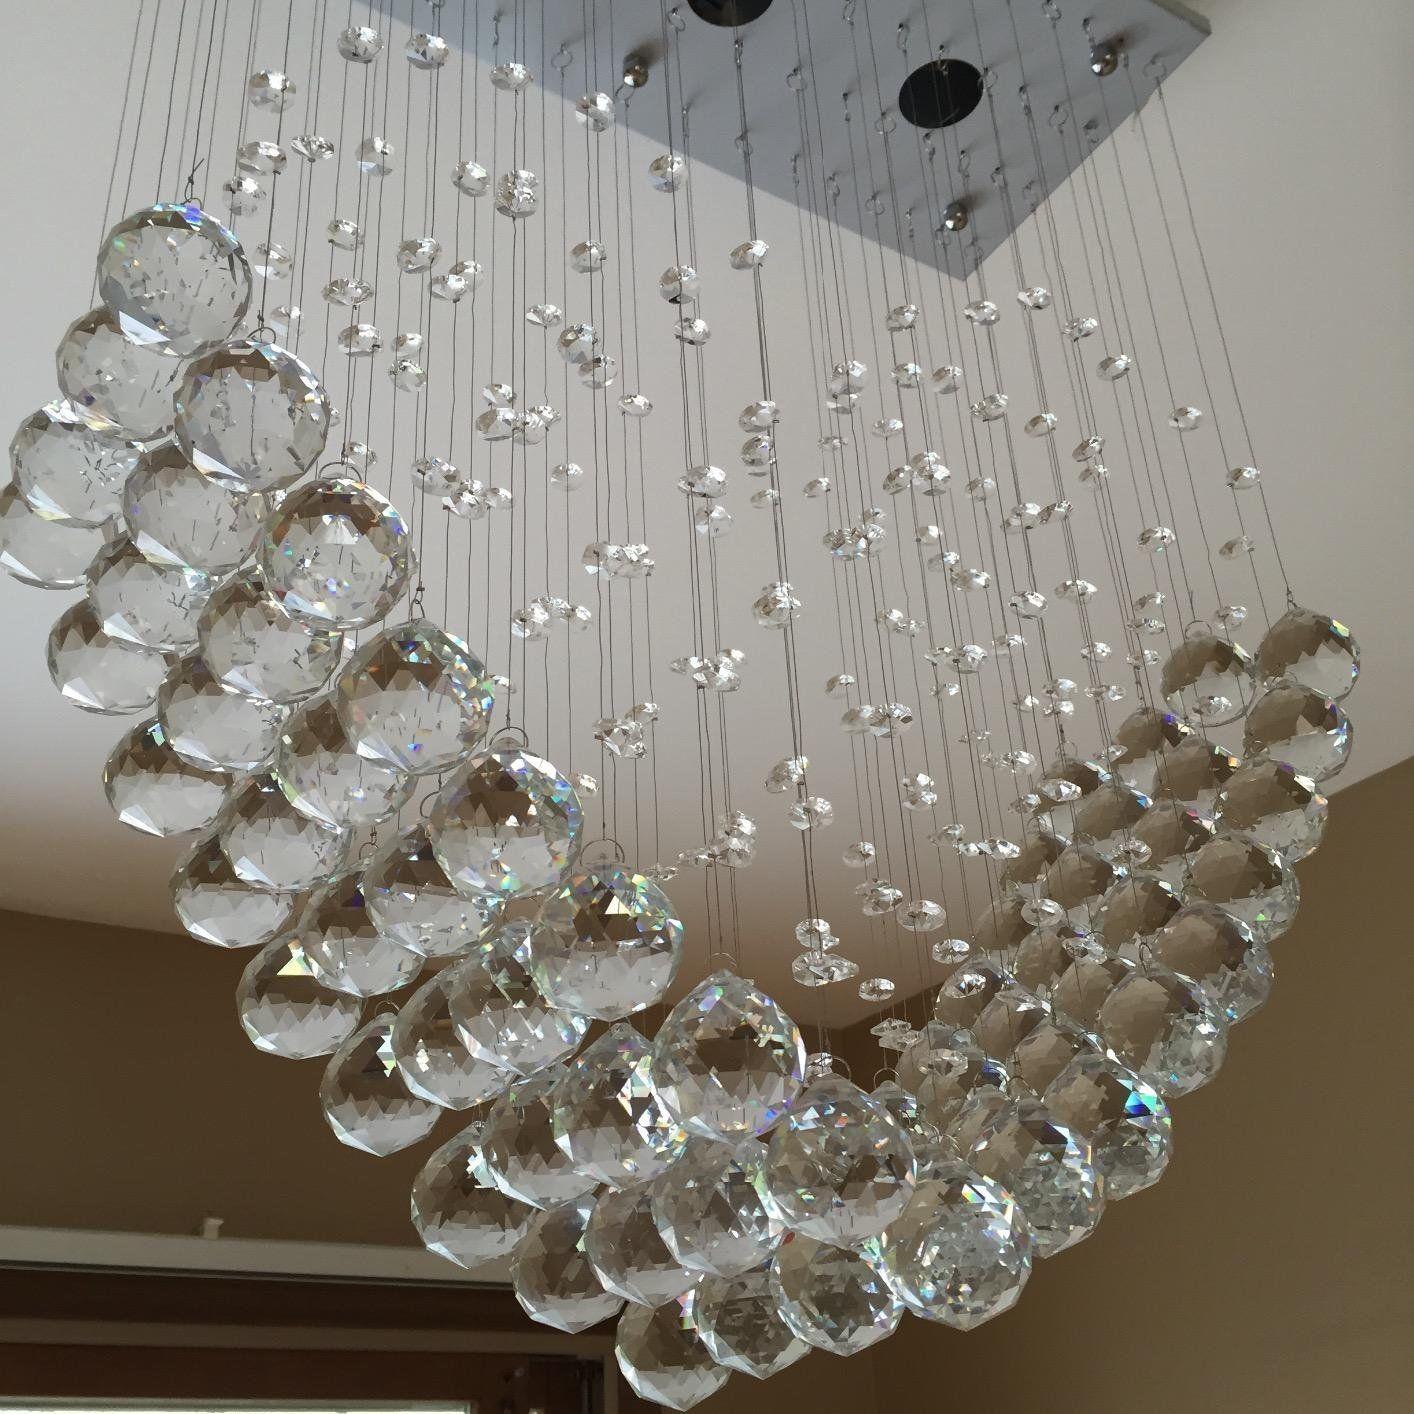 Modern Heart Crystal Pendant Lamp Ceiling Light Rain Drop